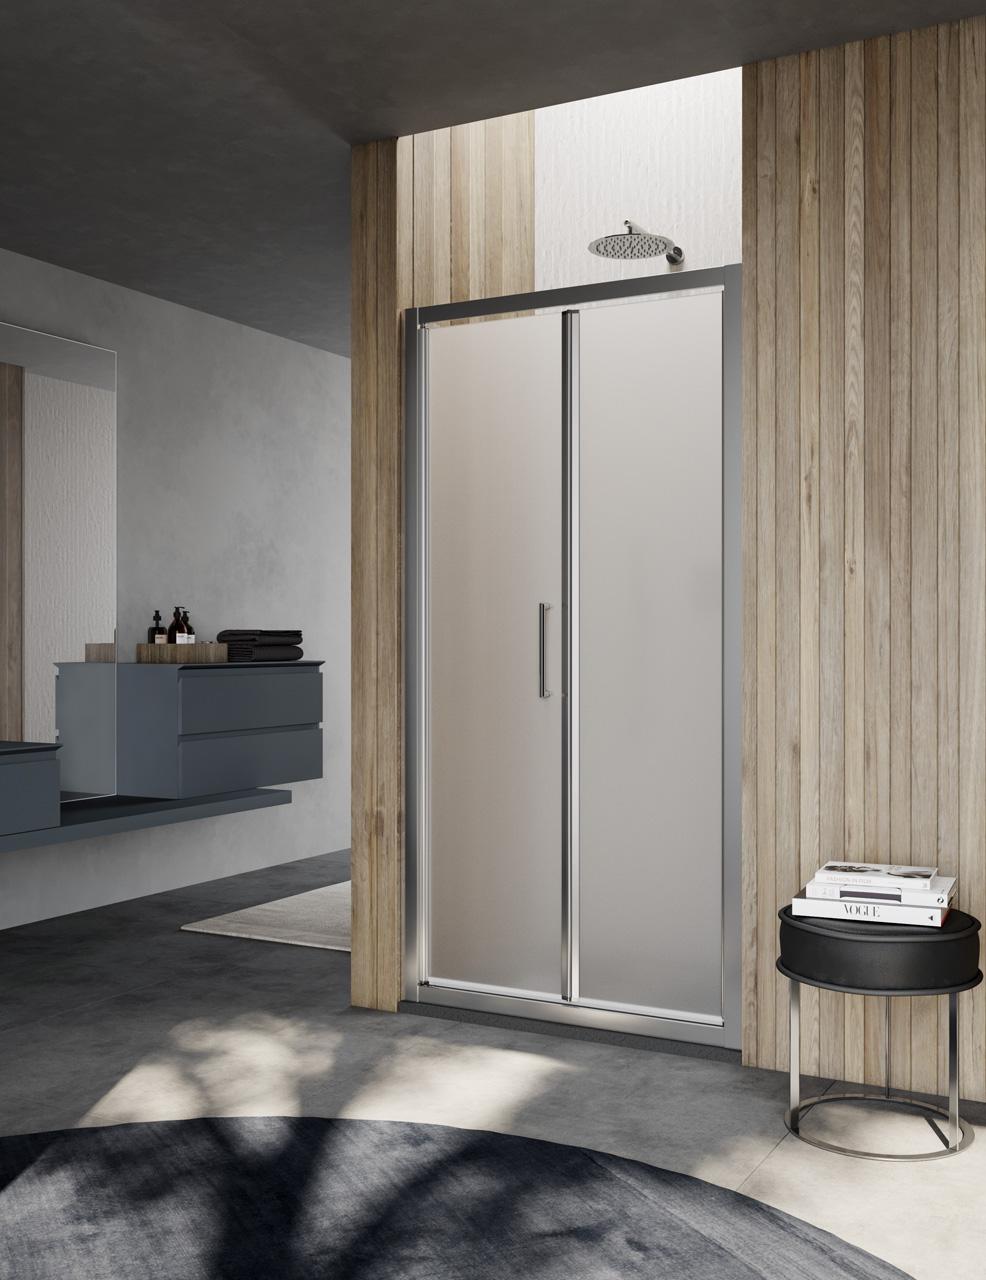 Box-Hera-Porta-Soffietto-Texture-Vanita-Docce